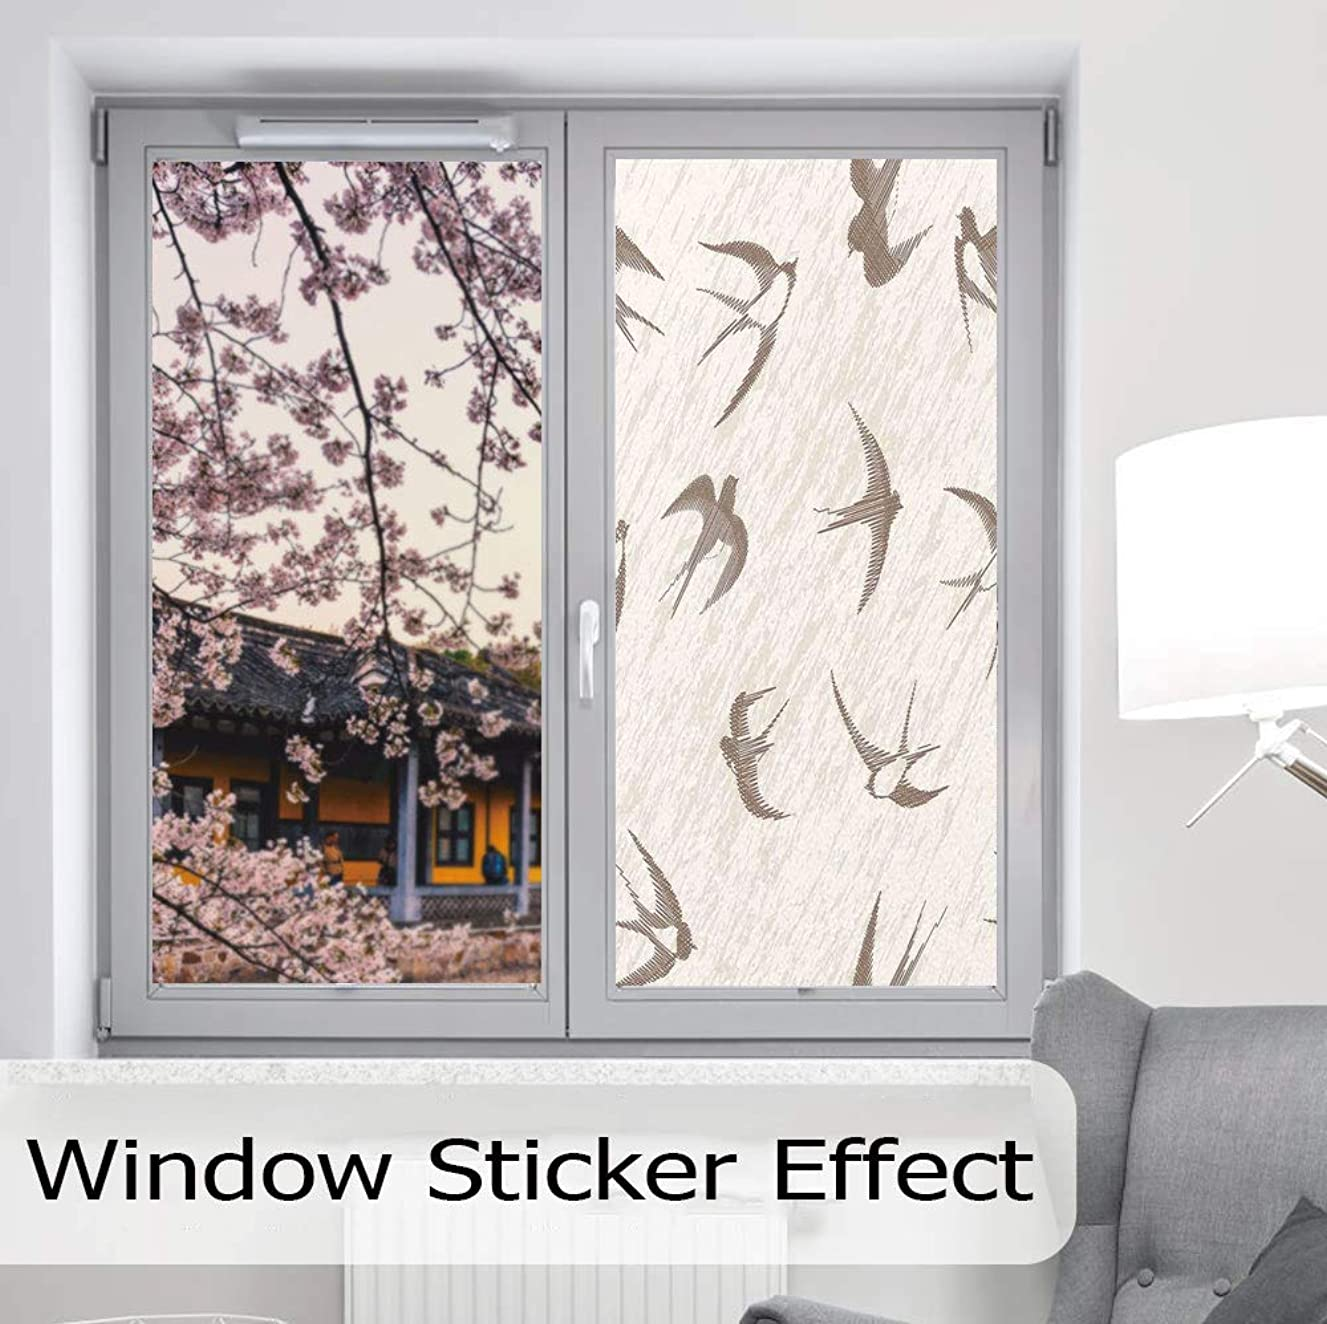 YOLIYANA Privacy Frosted Decorative Vinyl Decal Window Film,Birds,for Bathroom, Kitchen, Home, Easy to Install,Flying Bird Swallow Vintage Design Illustration Springtime Wildlife,24''x48''